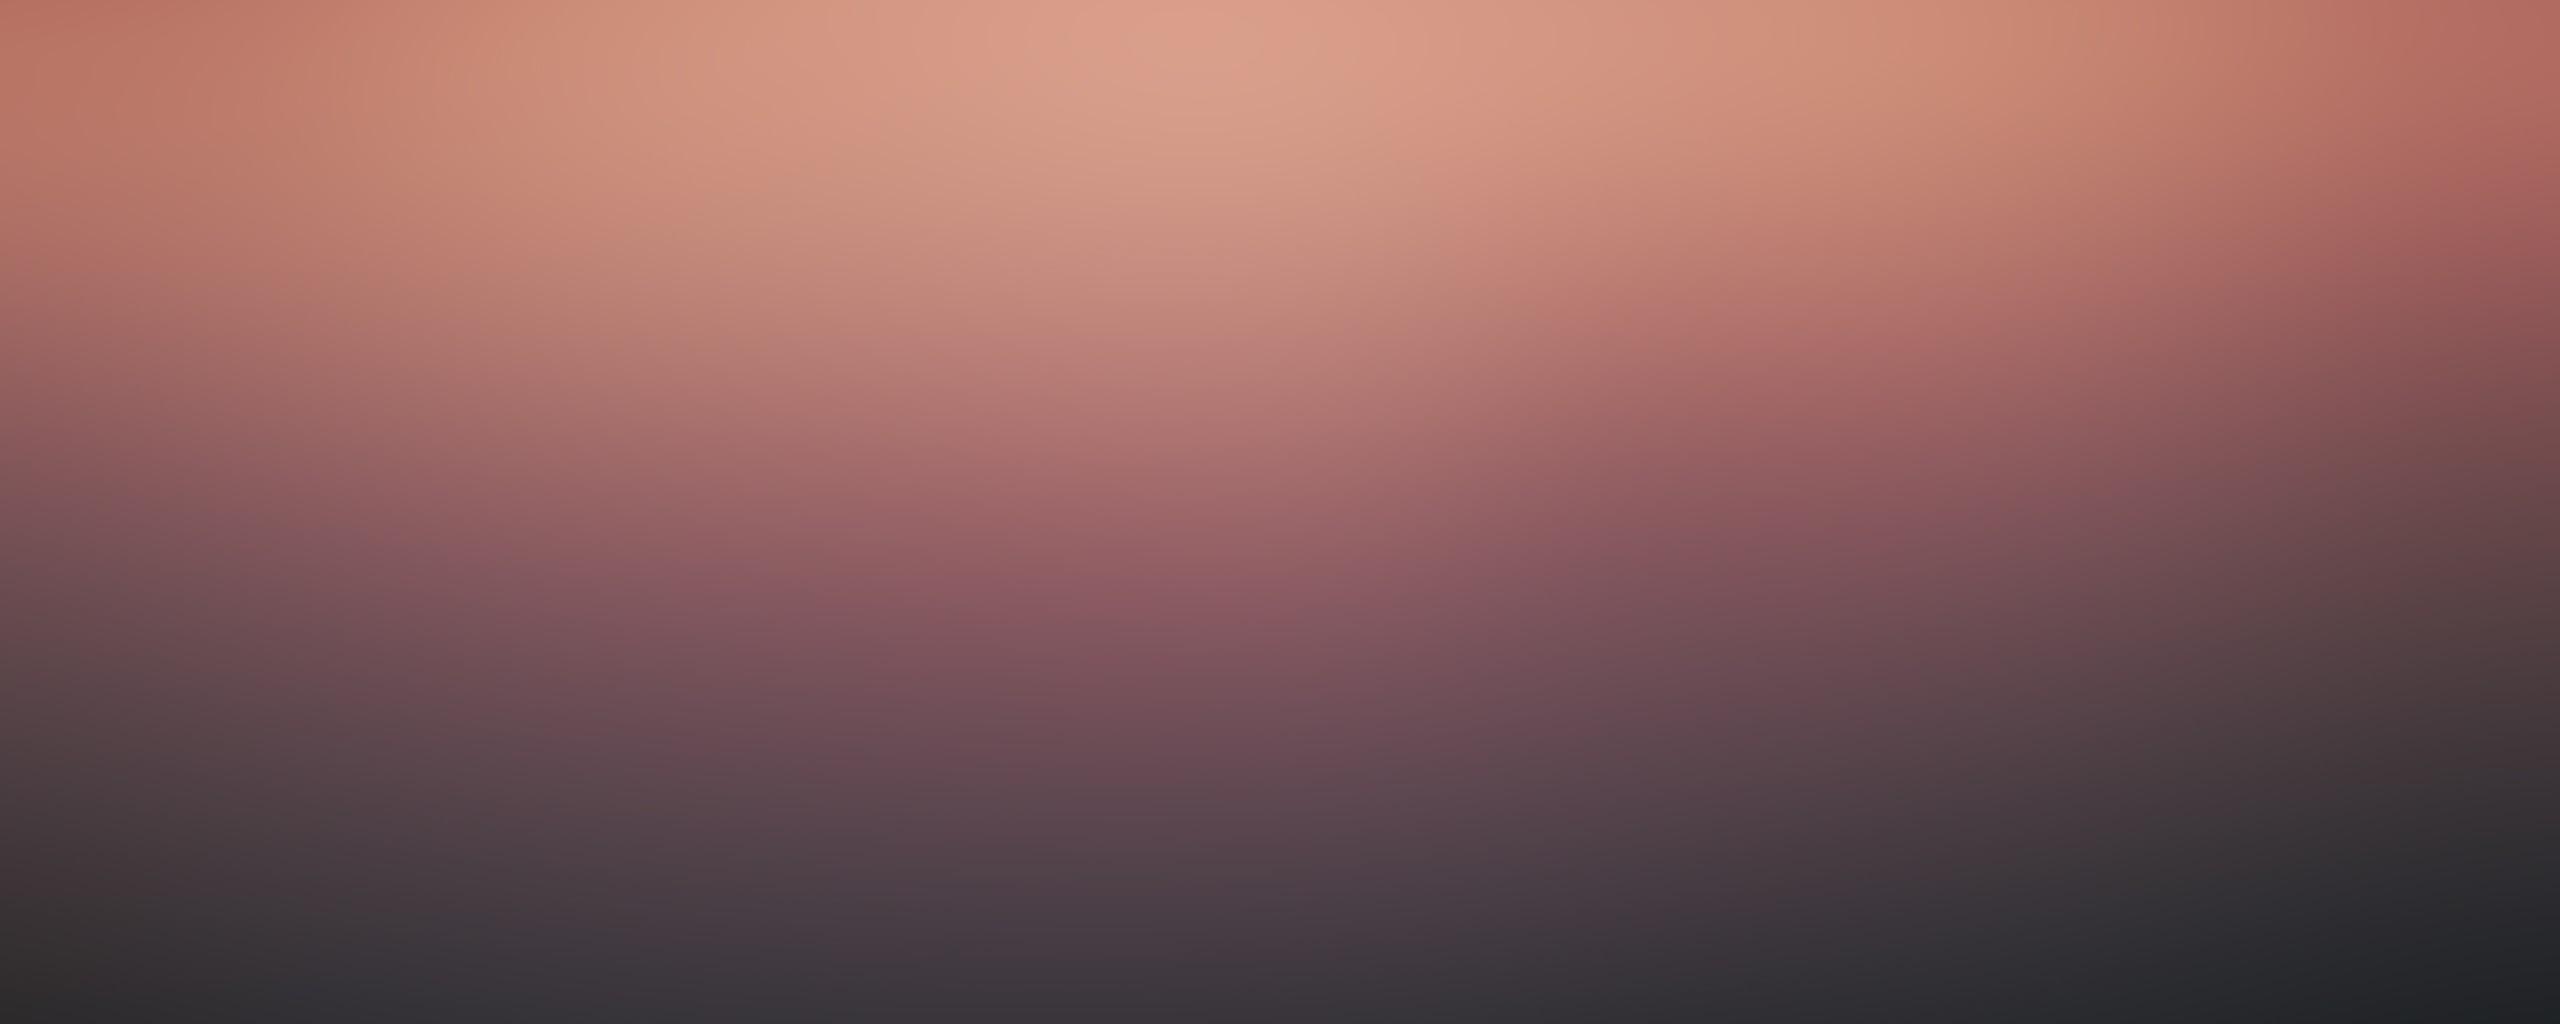 2560x1024 wallpaper Minimal, red dark gradient